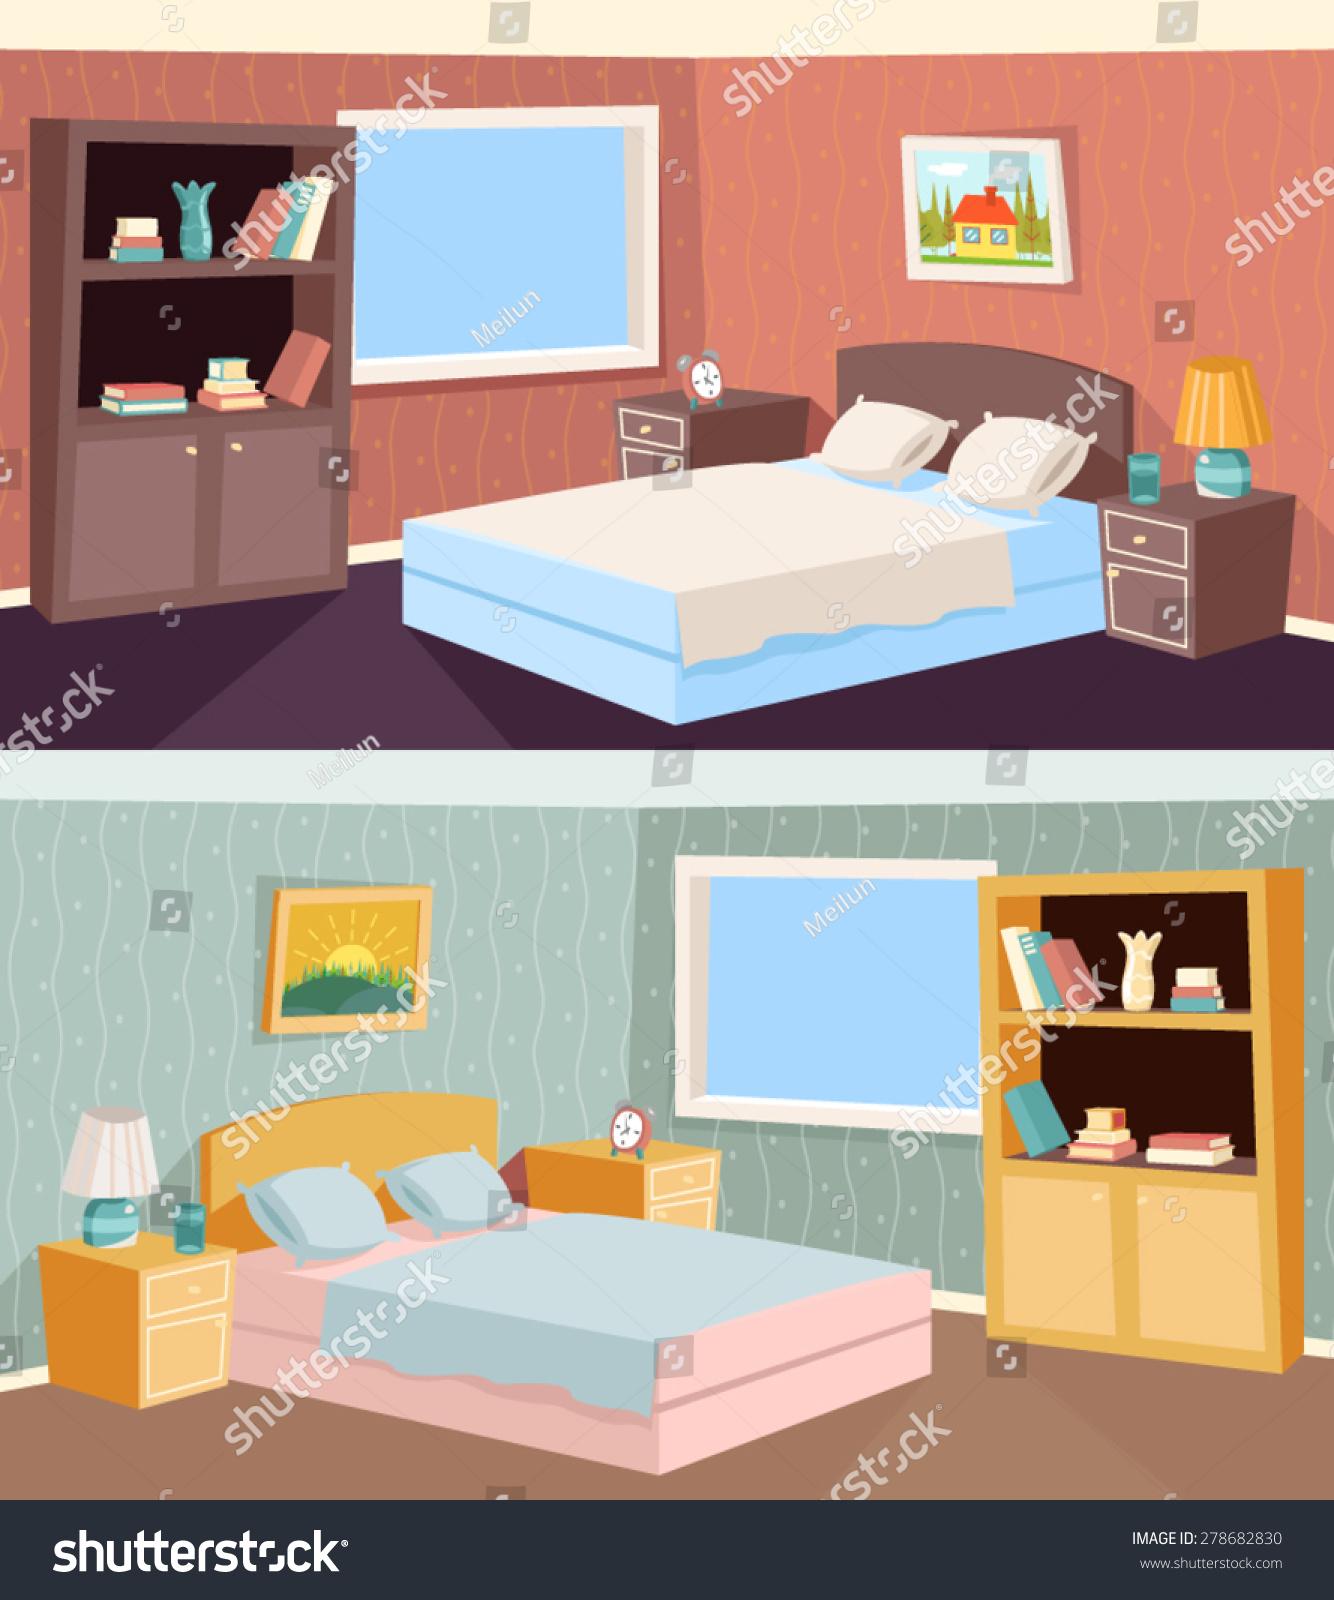 Cartoon Living Room: Cartoon Bedroom Apartment Living Room Interior Stock